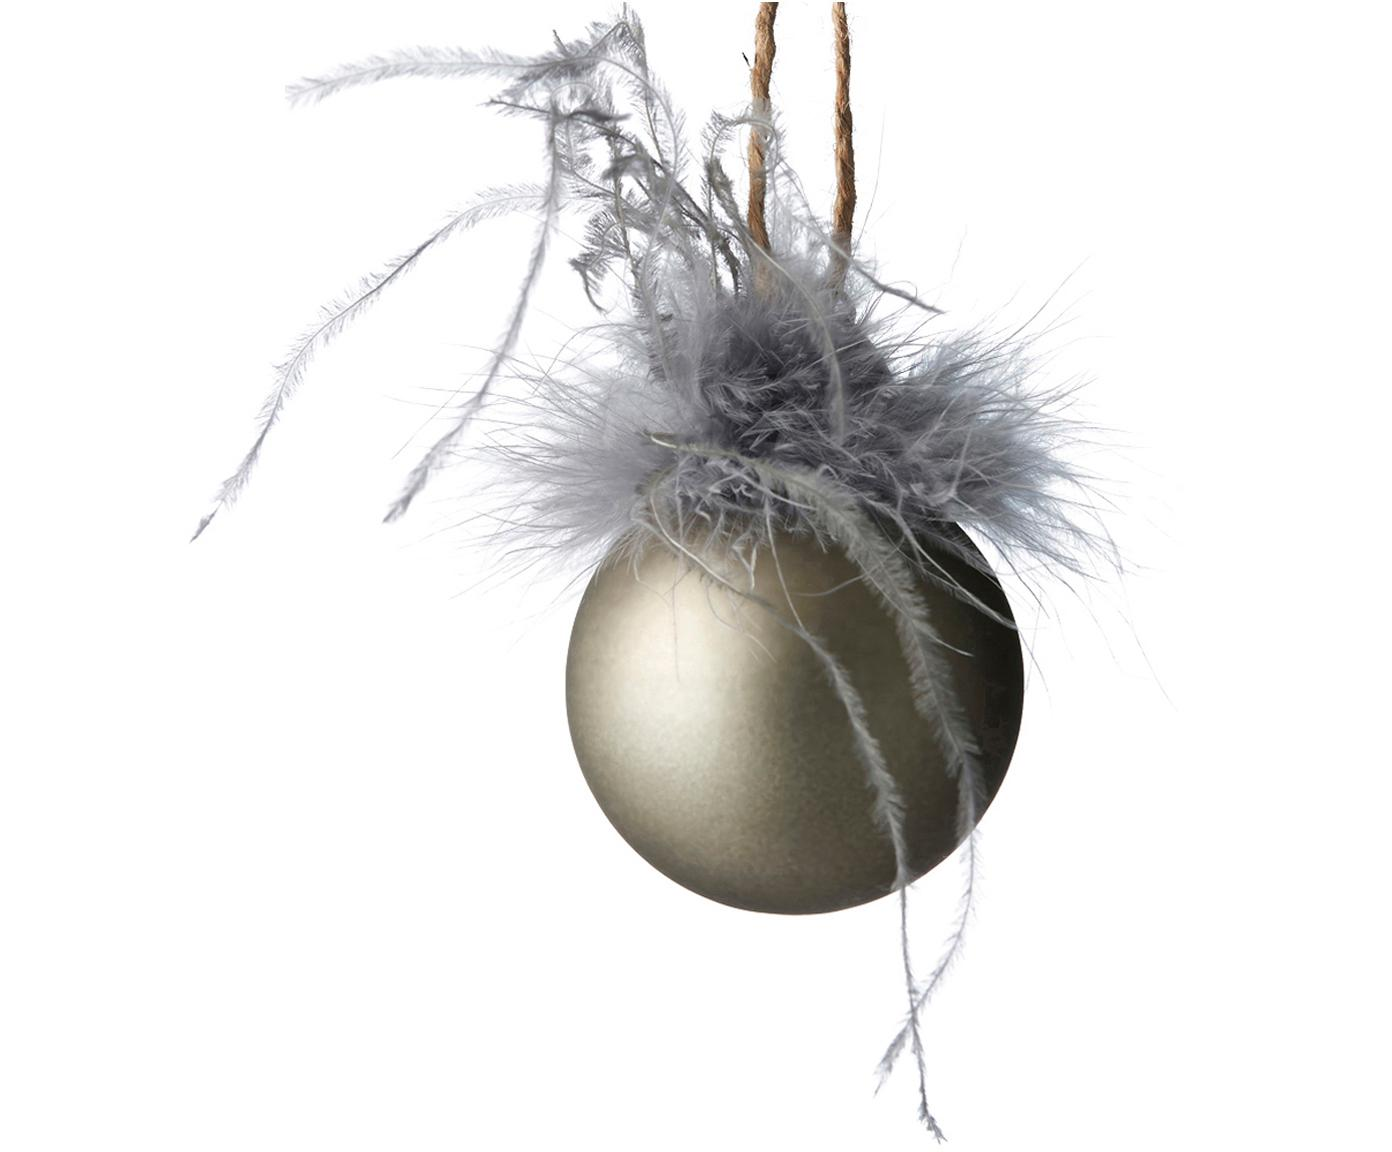 Weihnachtskugeln Fethia, 2 Stück, Dekor: Kunstfedern, Champagnerfarben, Ø 6 x H 8 cm